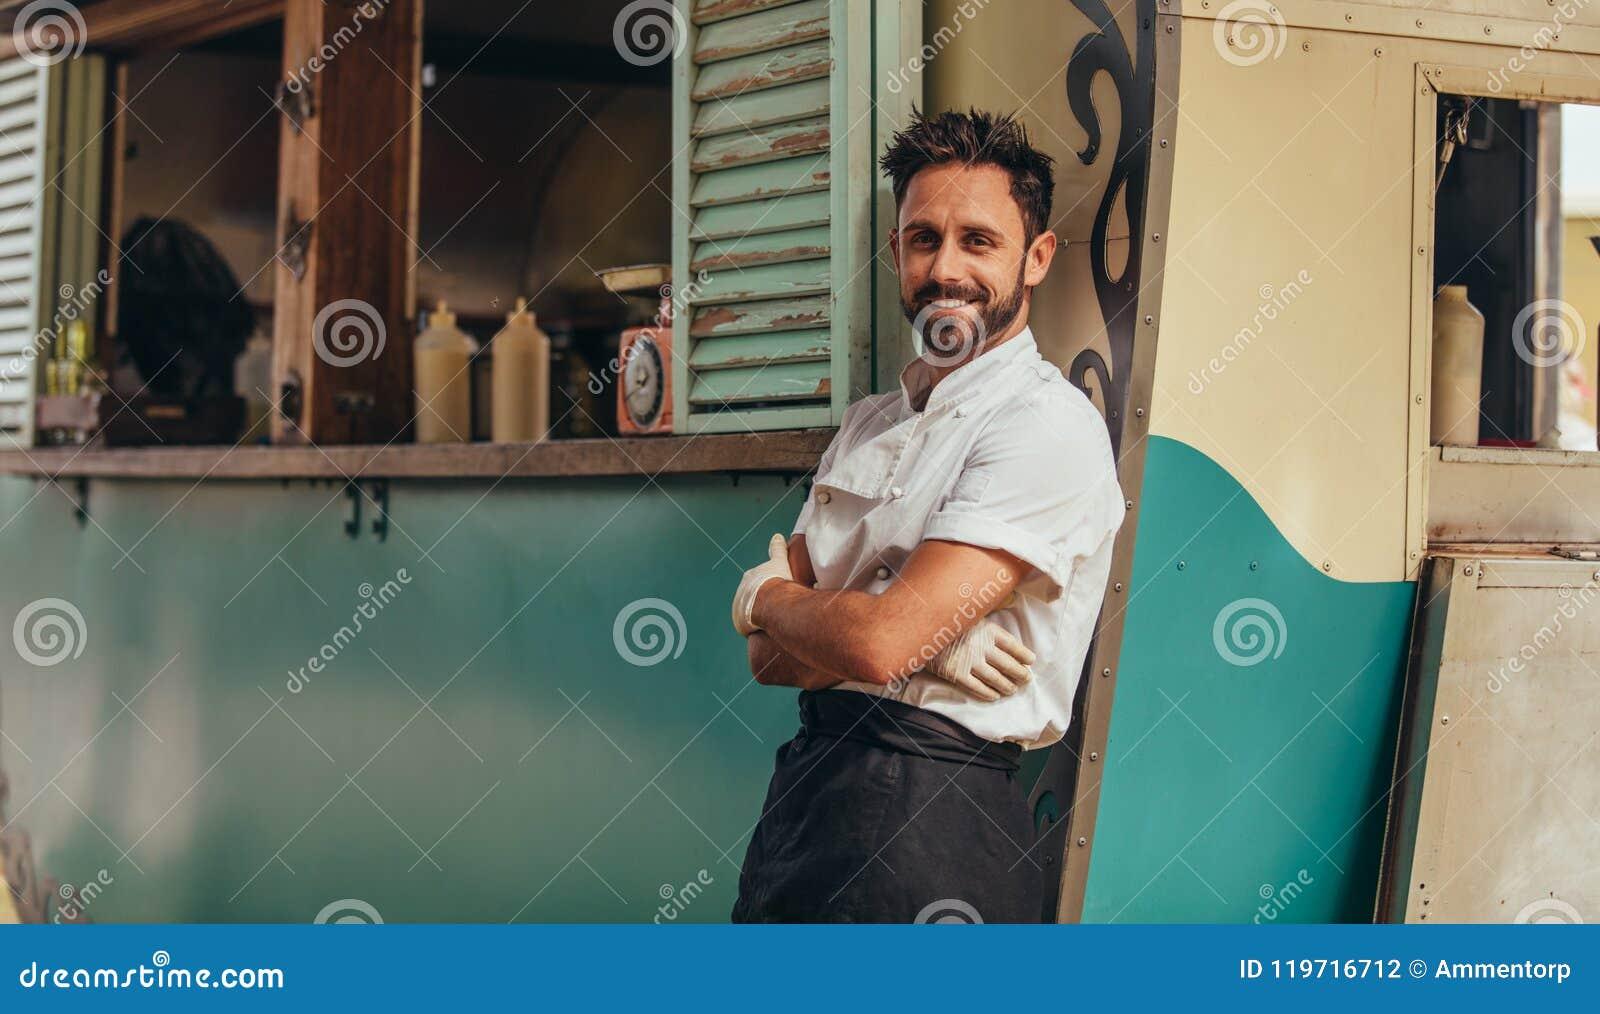 Proud food truck owner